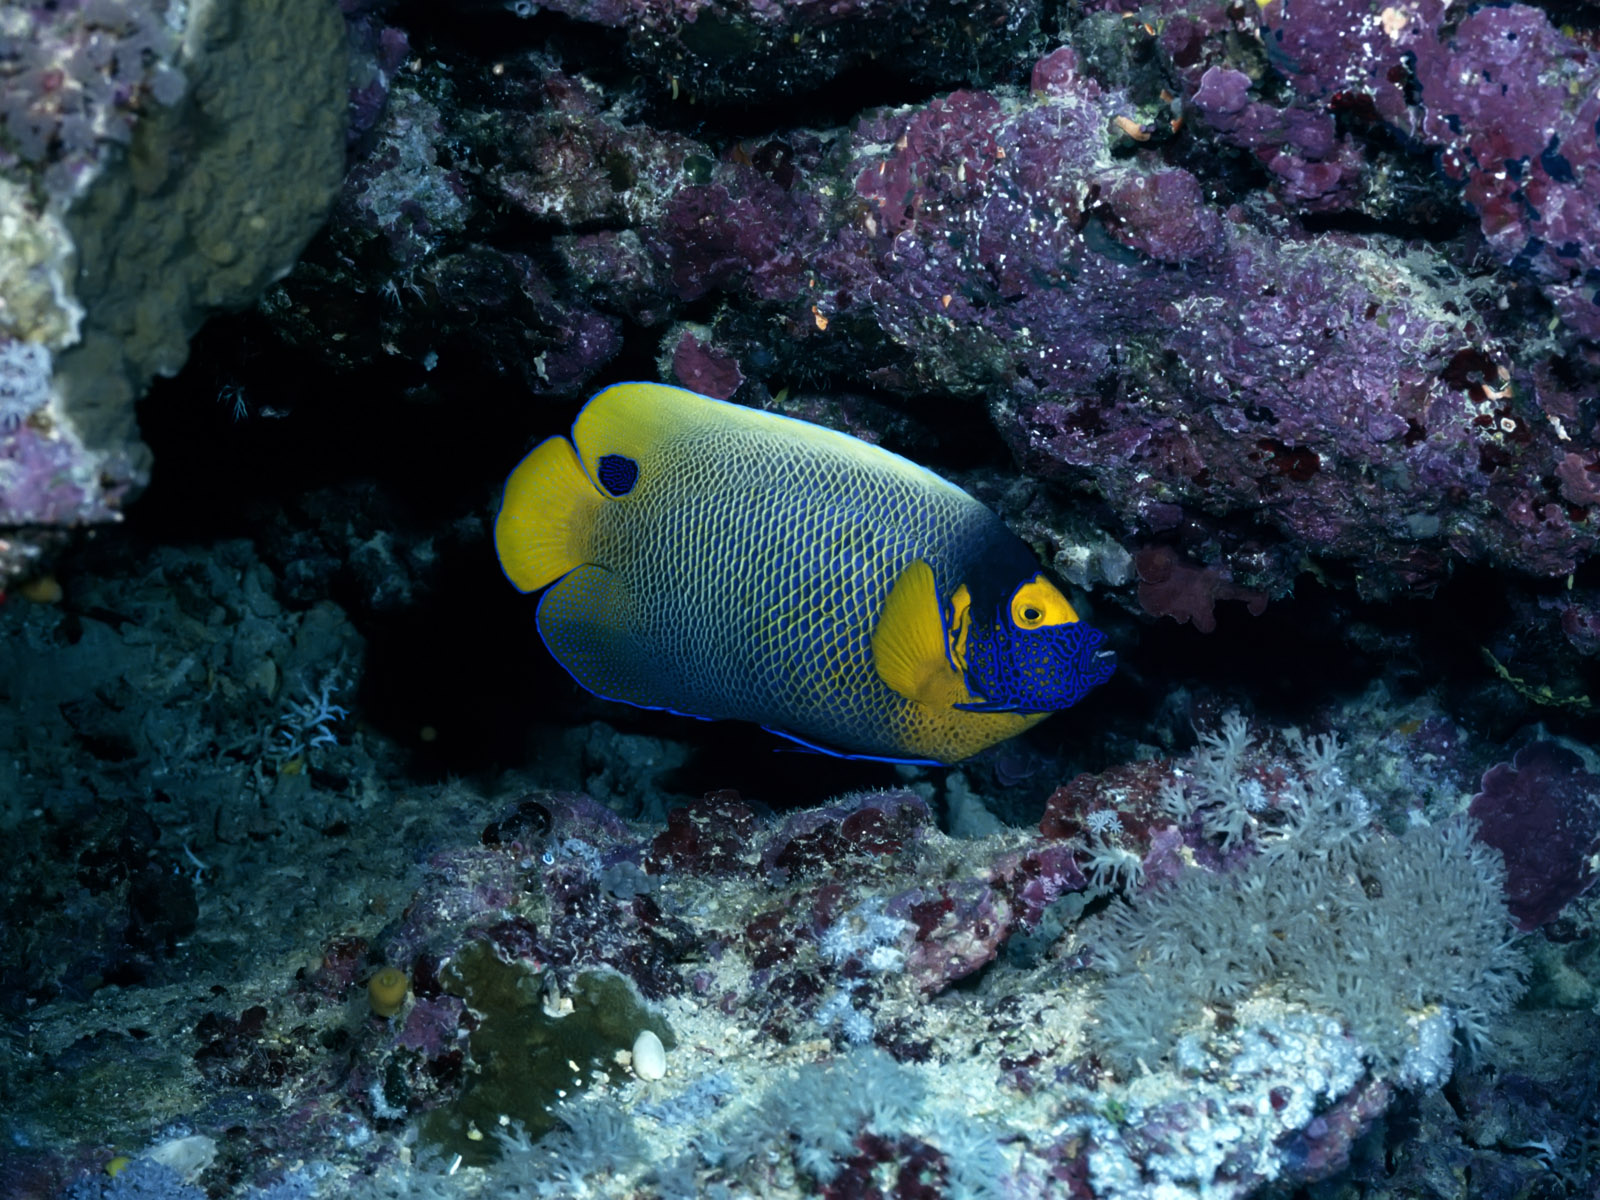 http://4.bp.blogspot.com/-rYj0y365dhc/TkvhsI_fYRI/AAAAAAAALo0/HeAuA1m8FLY/s1600/Underwater+Wallpapers+%252894%2529.jpg